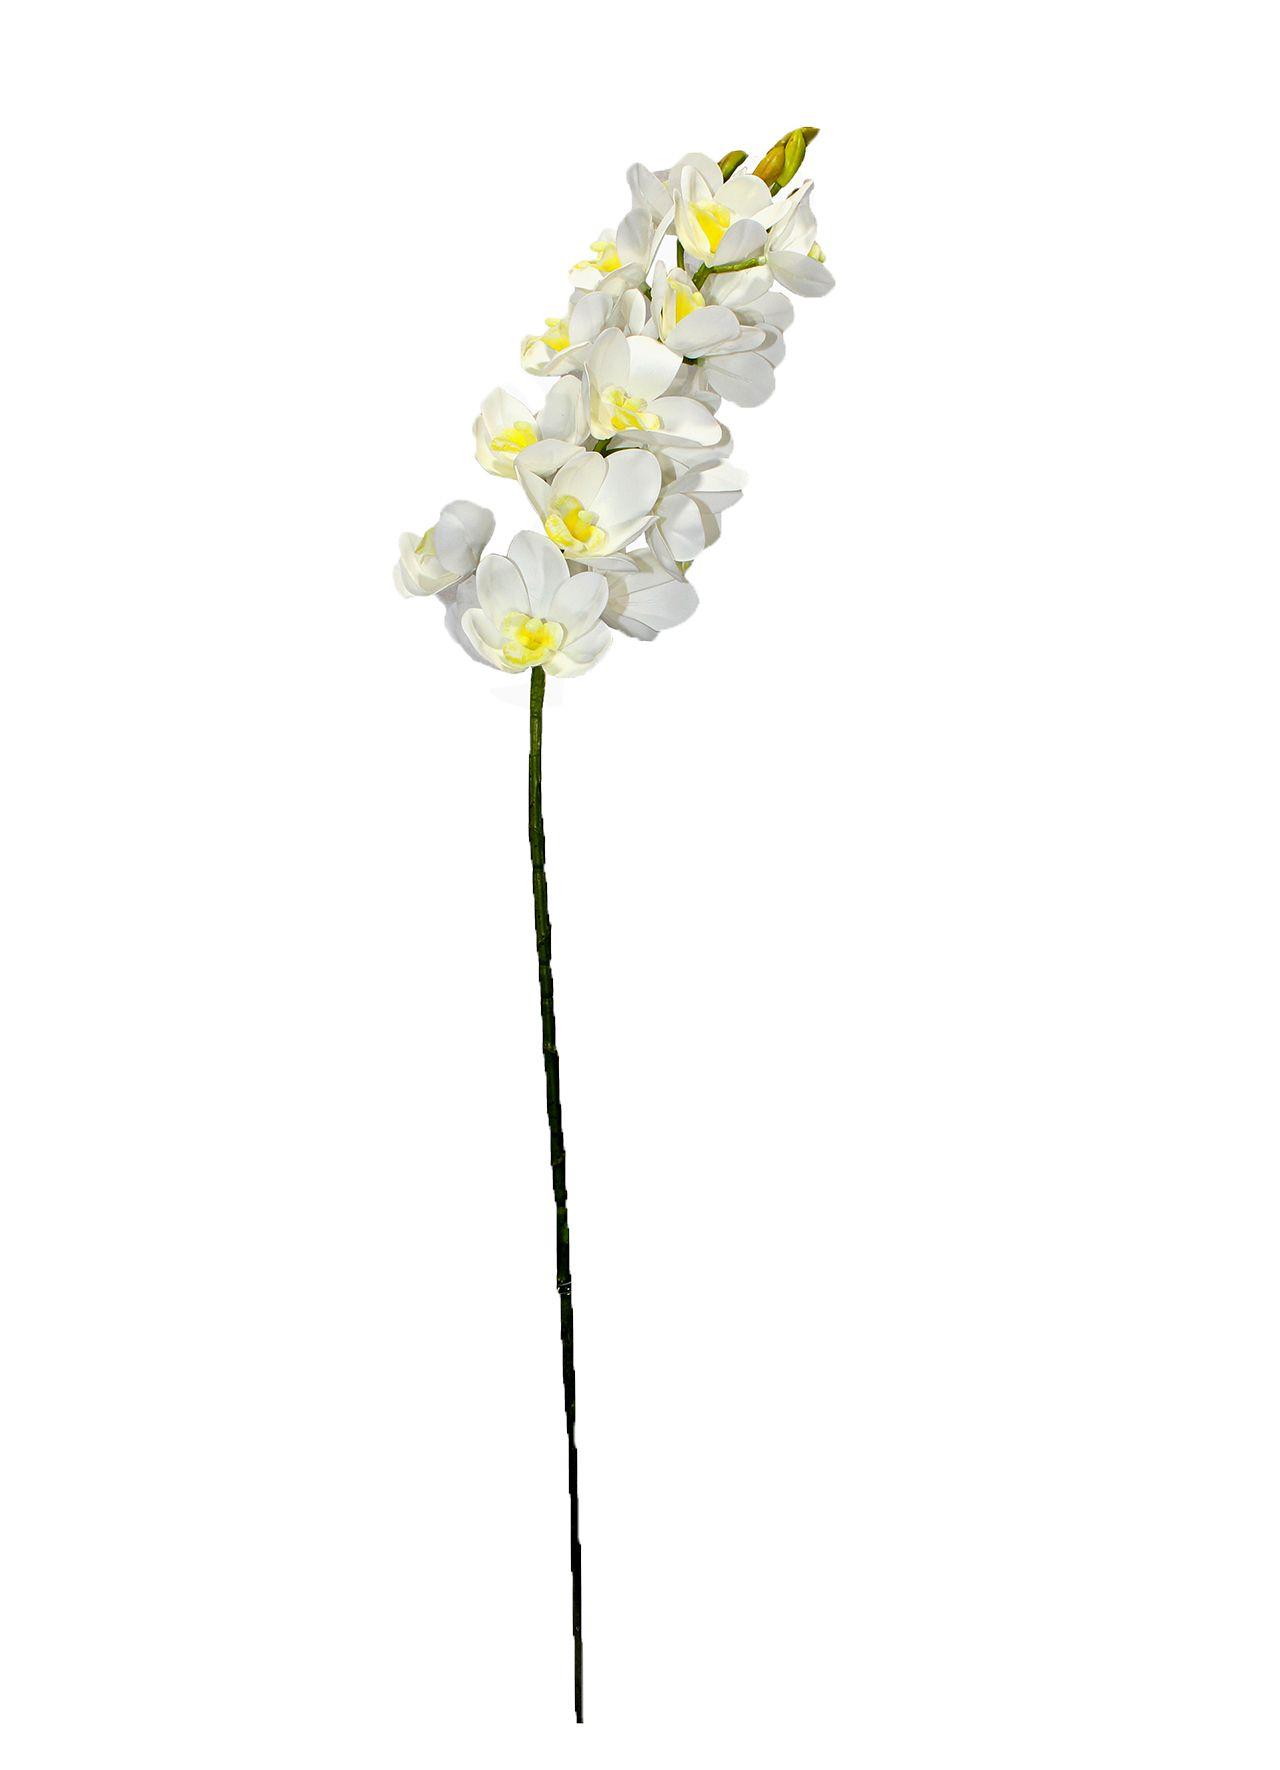 Flor de orquídea - X20  - 83cm